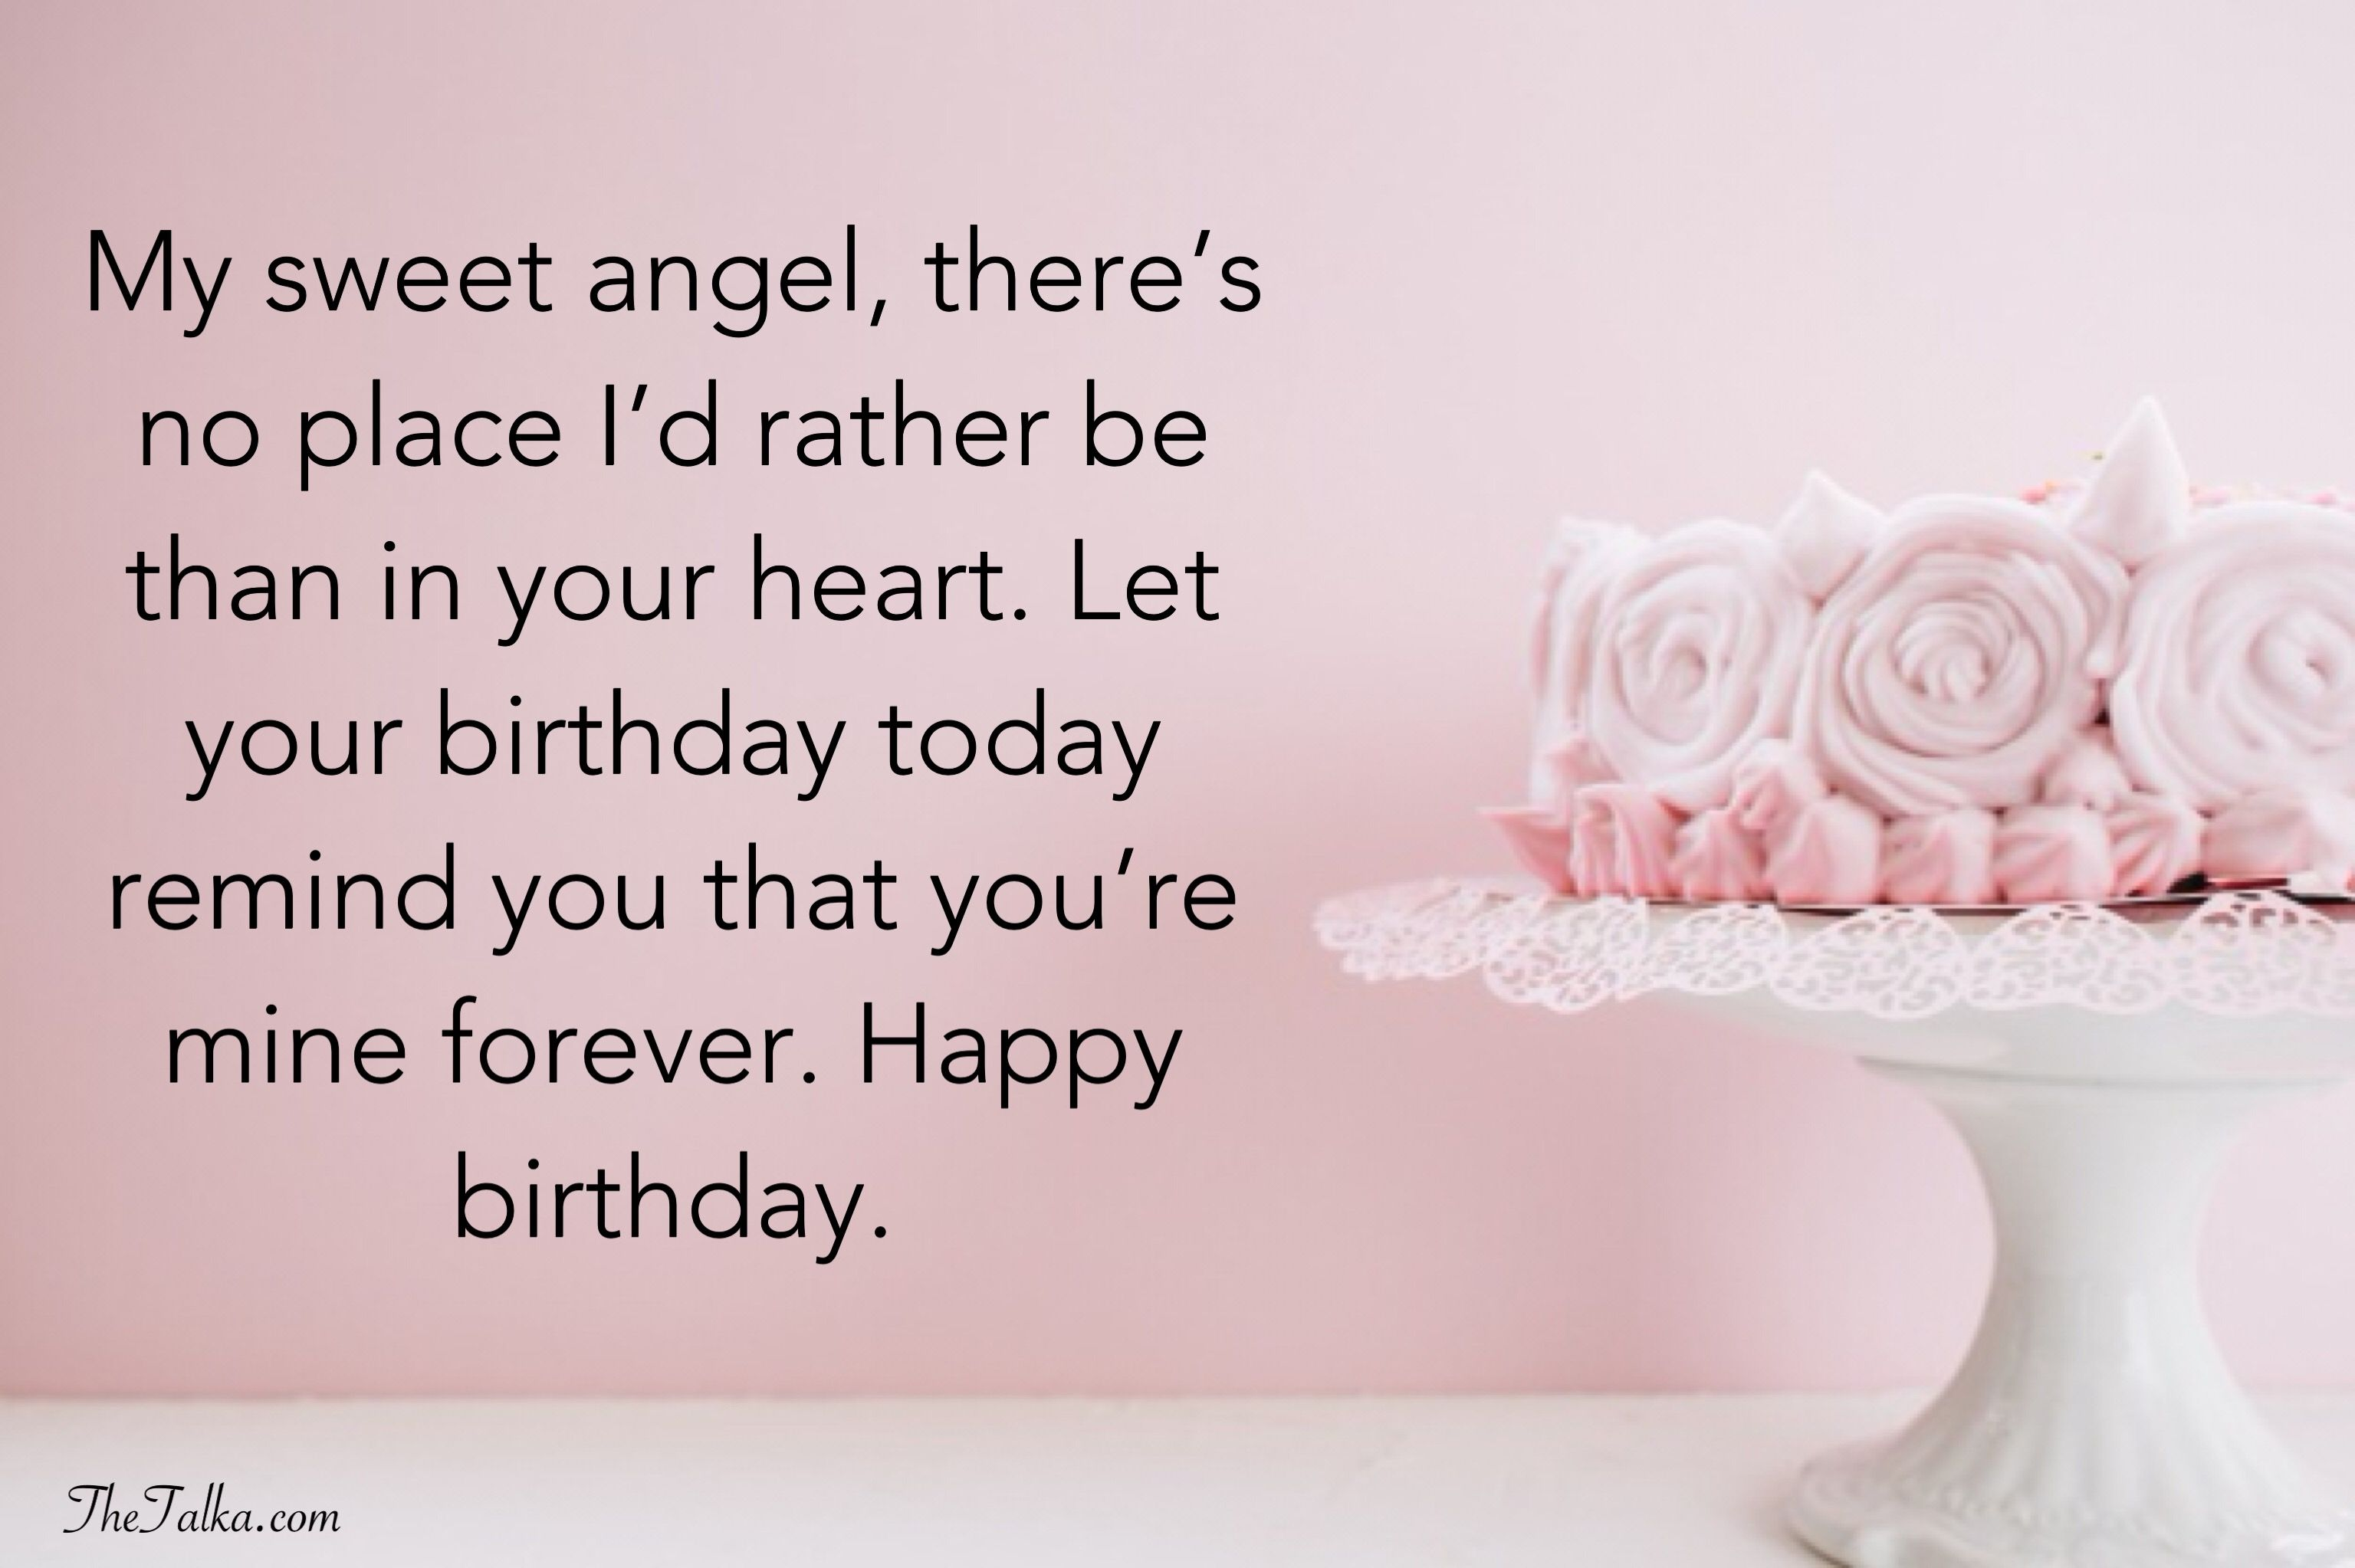 Birthday Wishes For Girlfriend Heart Warming Impressive Funny Birthday Wishes For Girlfriend Cute Happy Birthday Wishes Birthday Greetings For Girlfriend